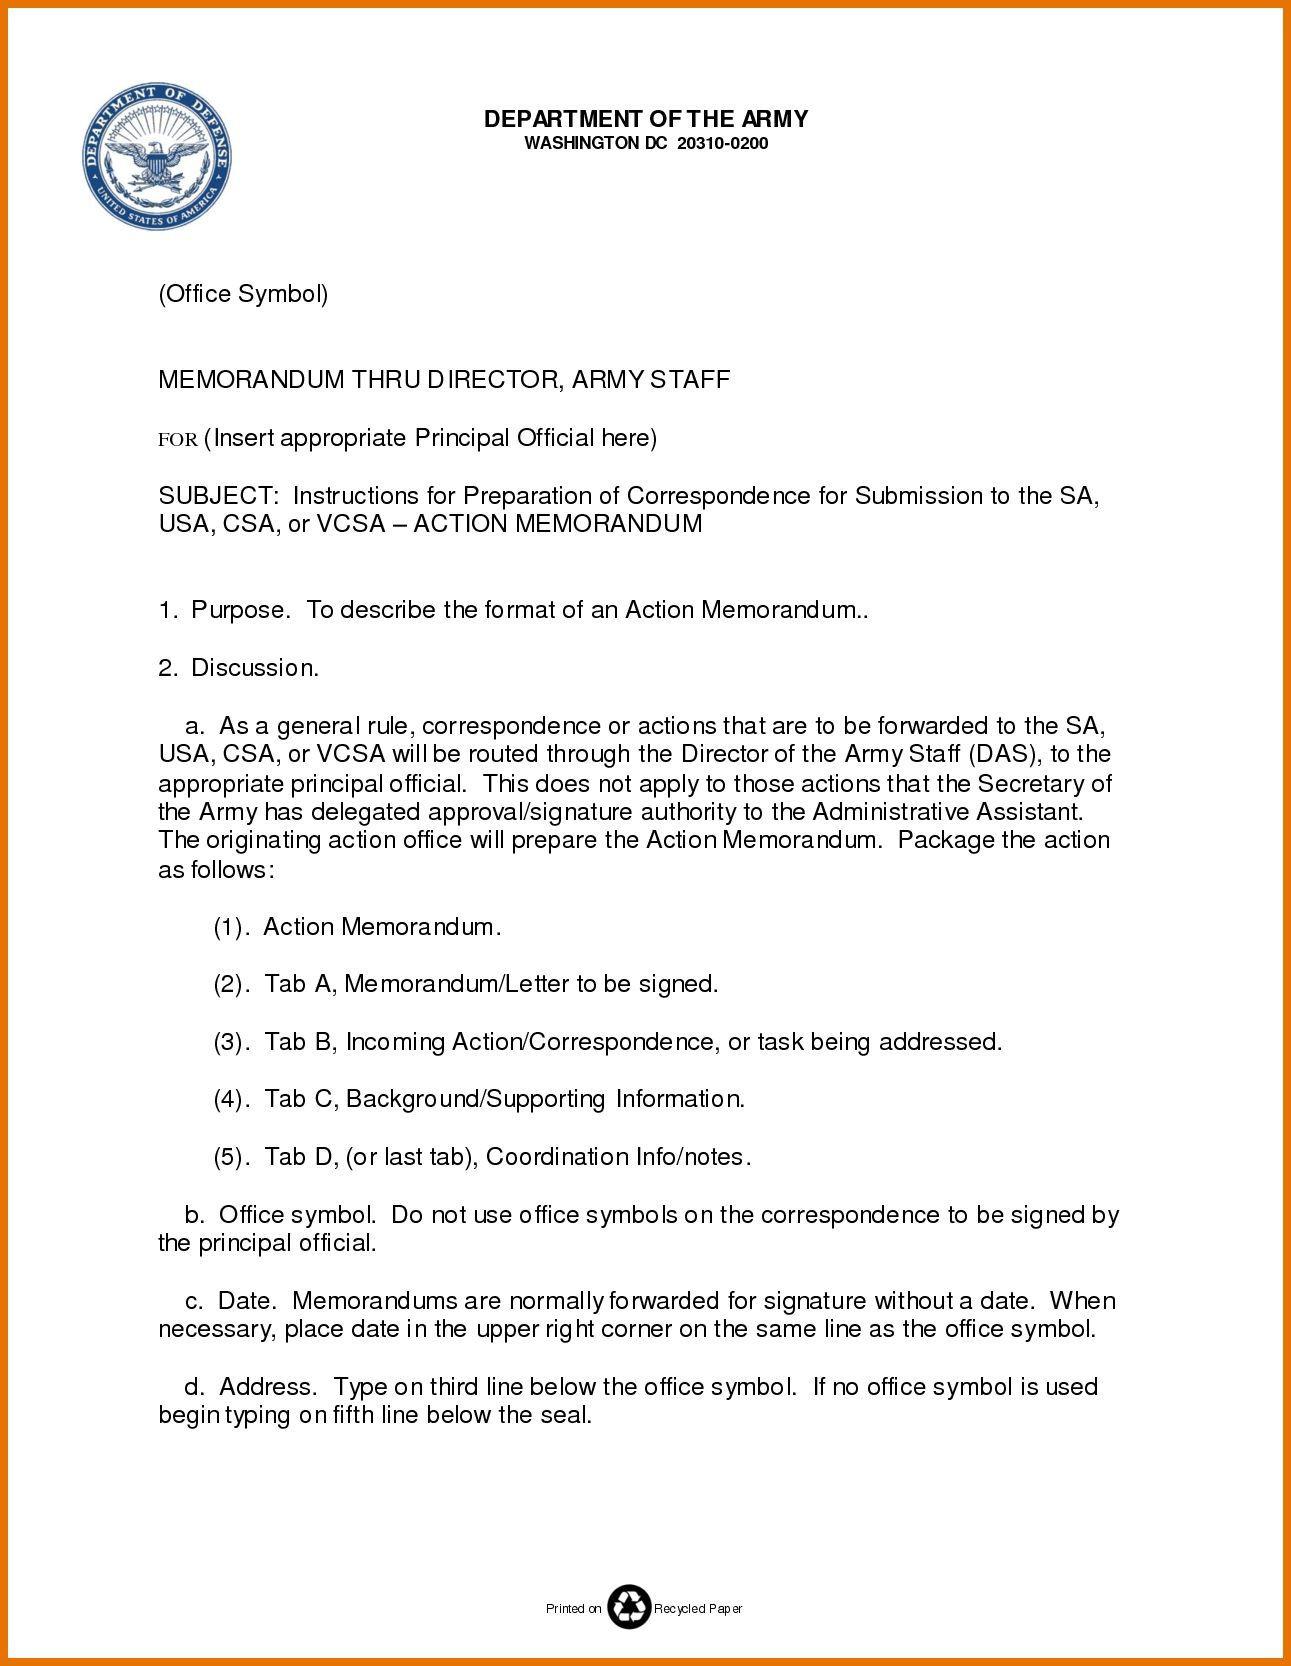 002 Best Microsoft Word Army Memorandum Template High Def Full